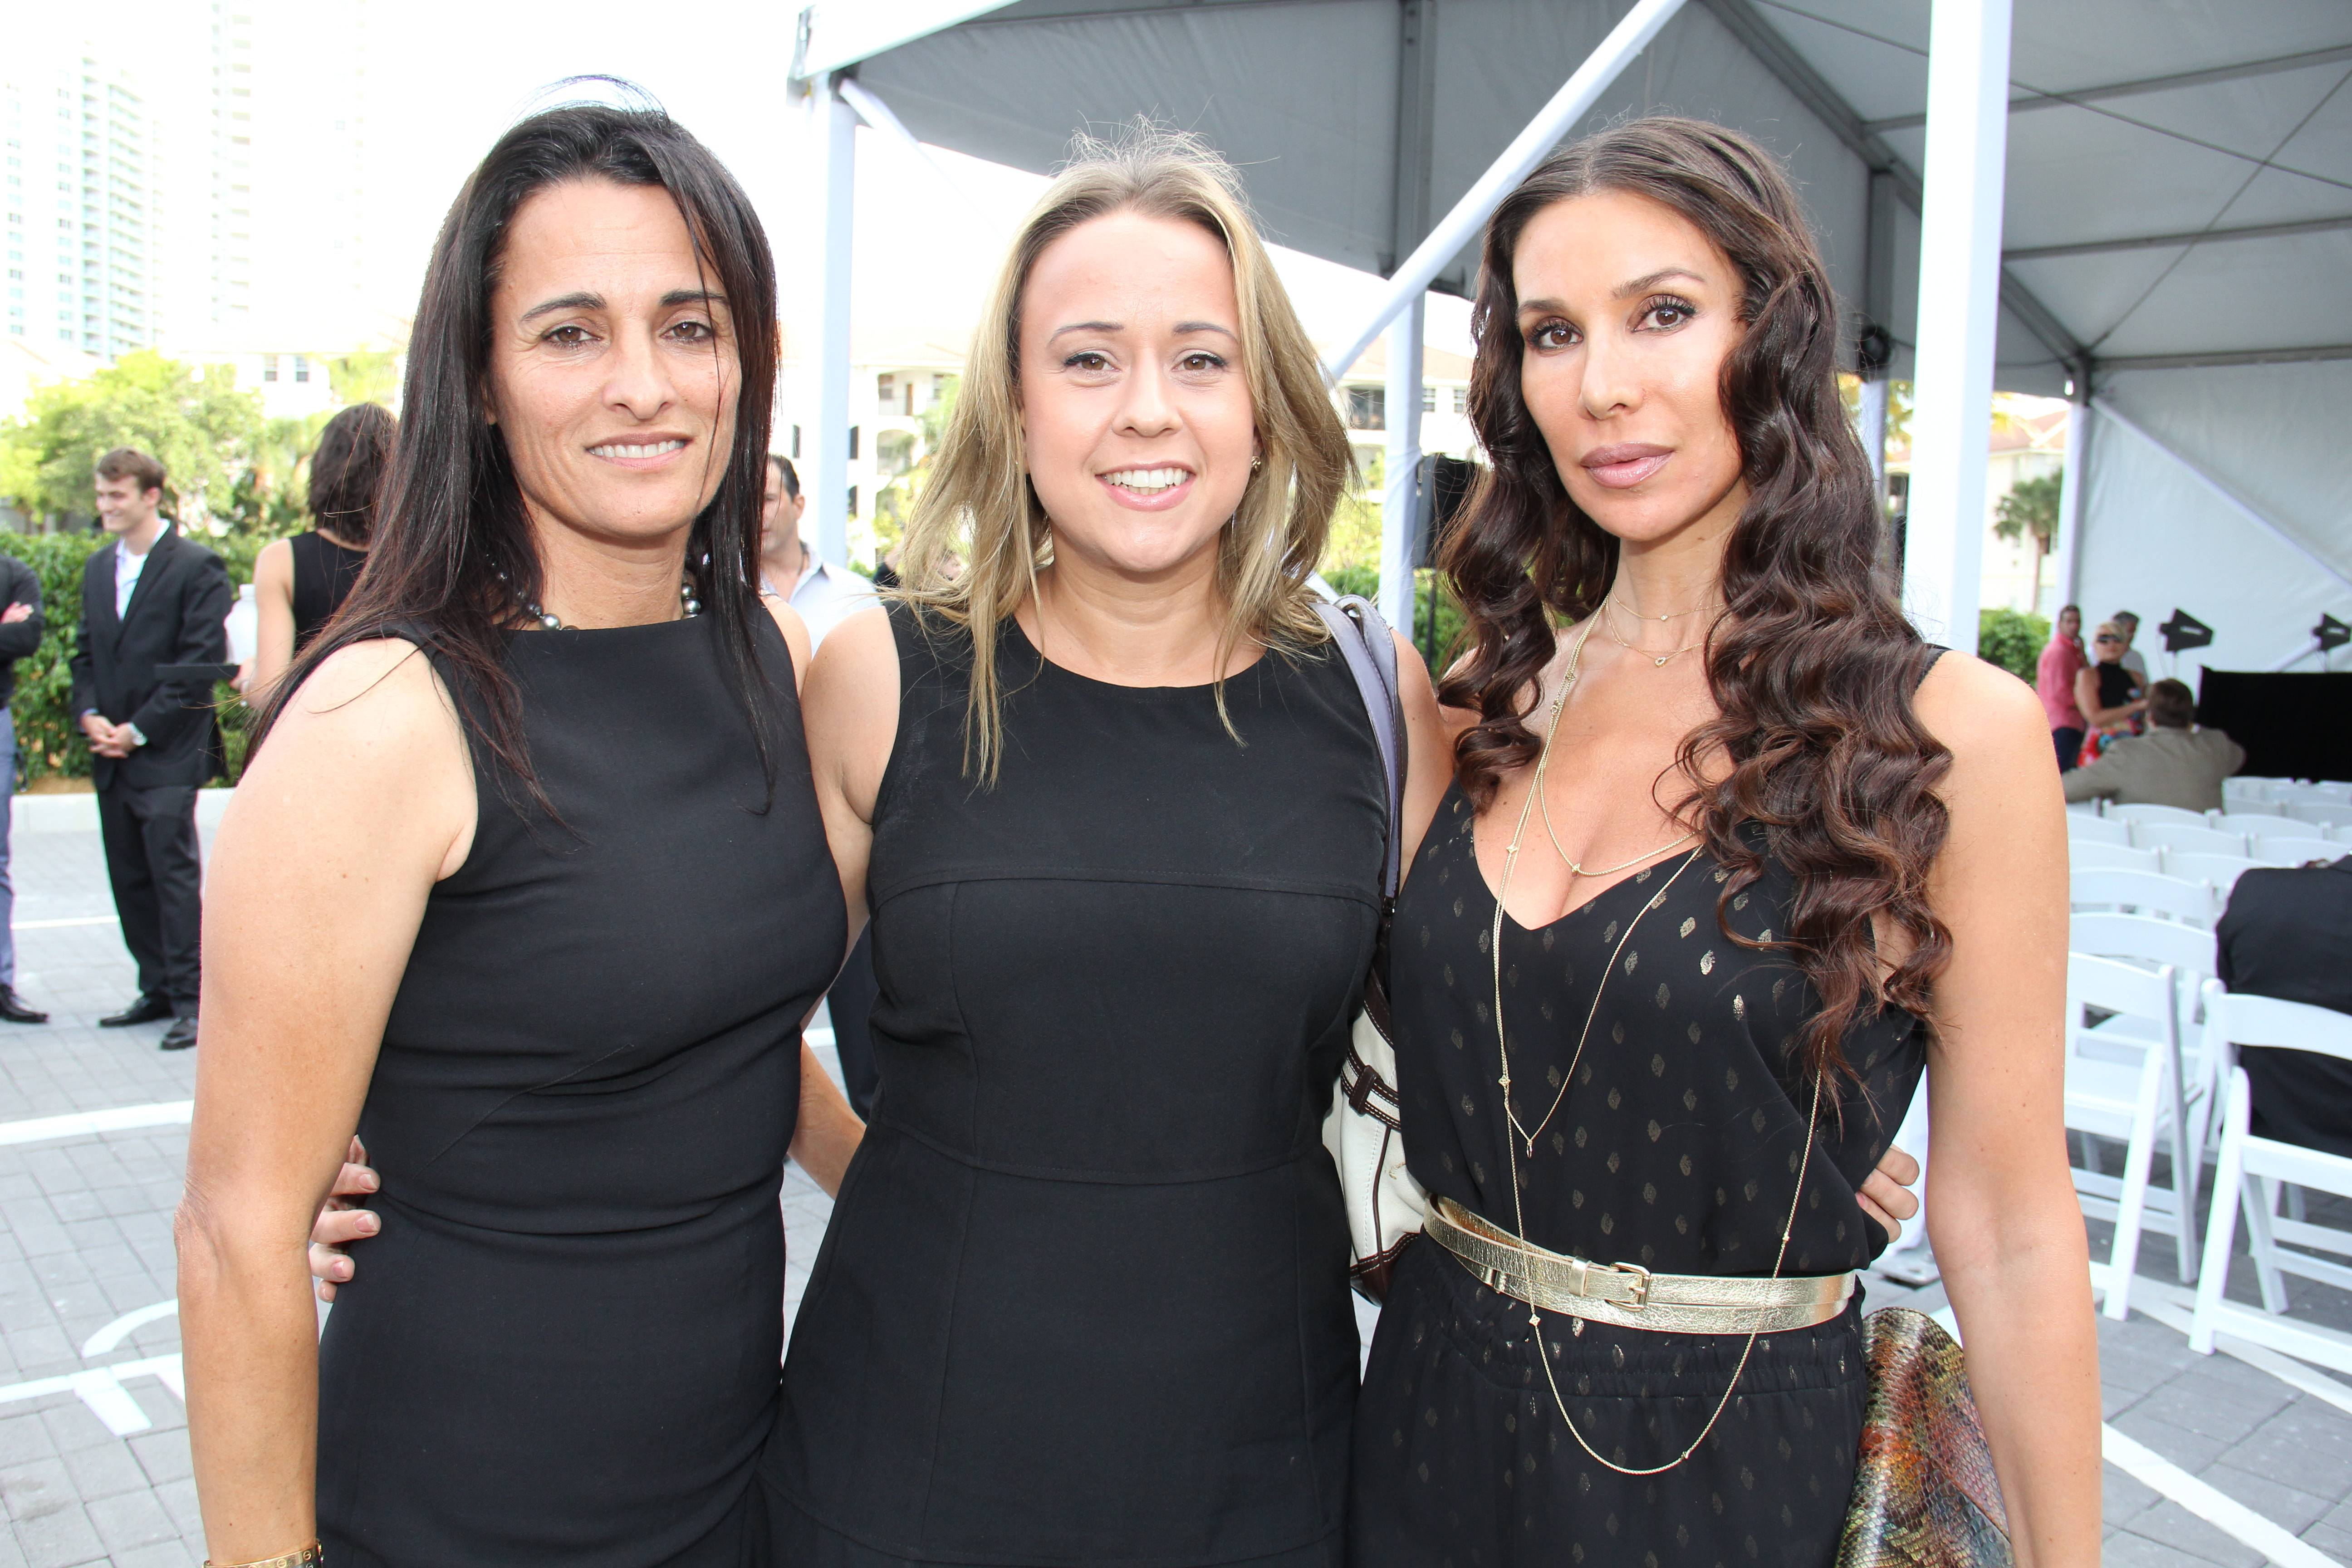 Avra Jain, Nathalie Birkenfeld, Andrea Baclea